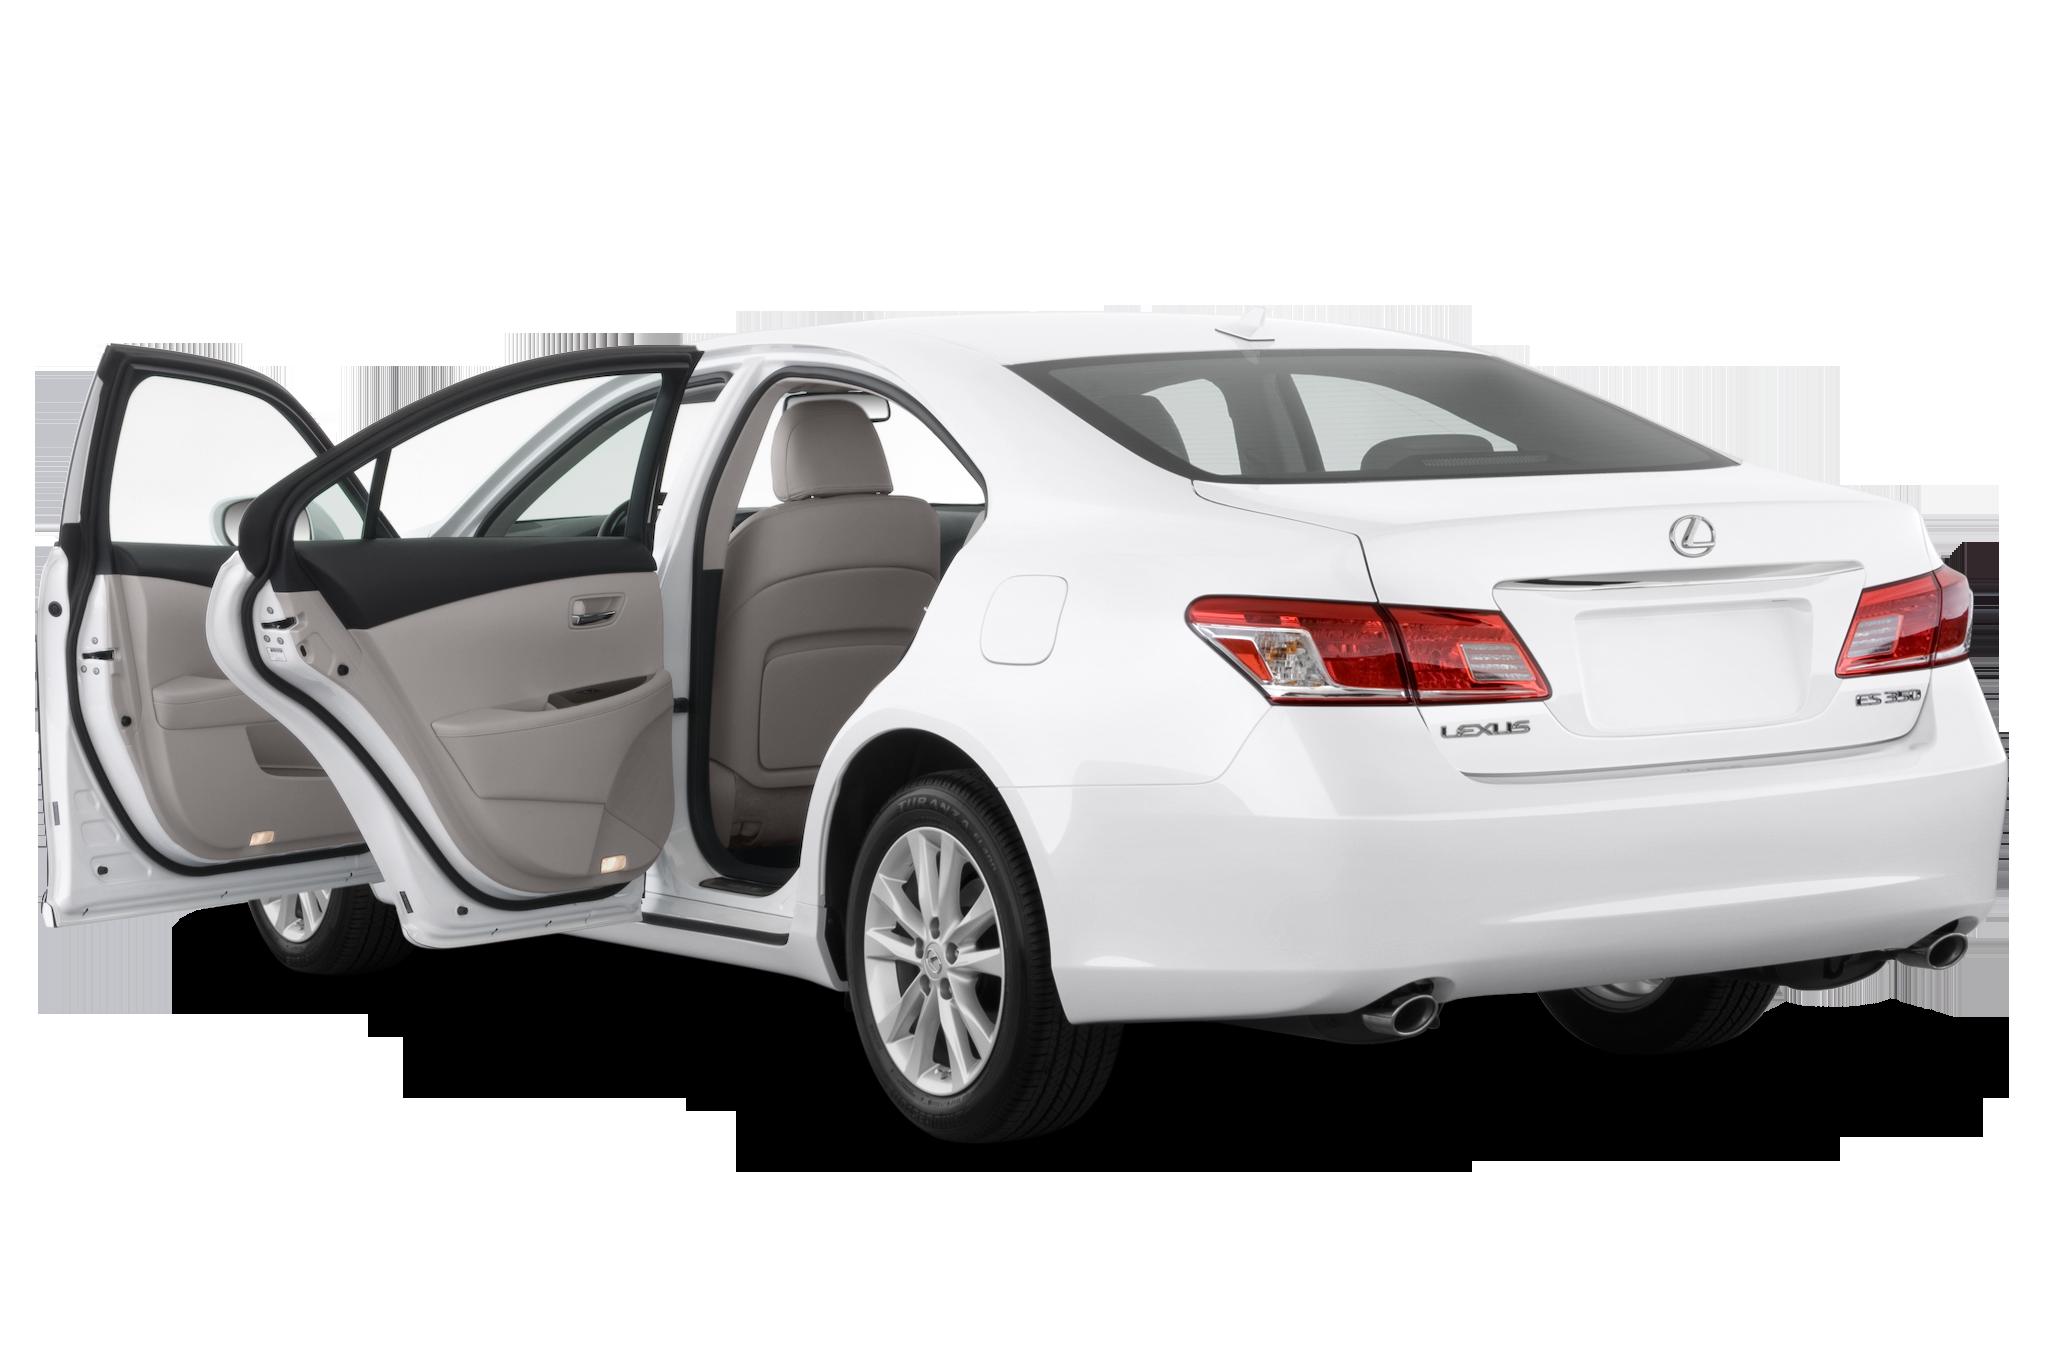 2010 Lexus ES350 - Lexus Luxury Sedan Review - Automobile ...